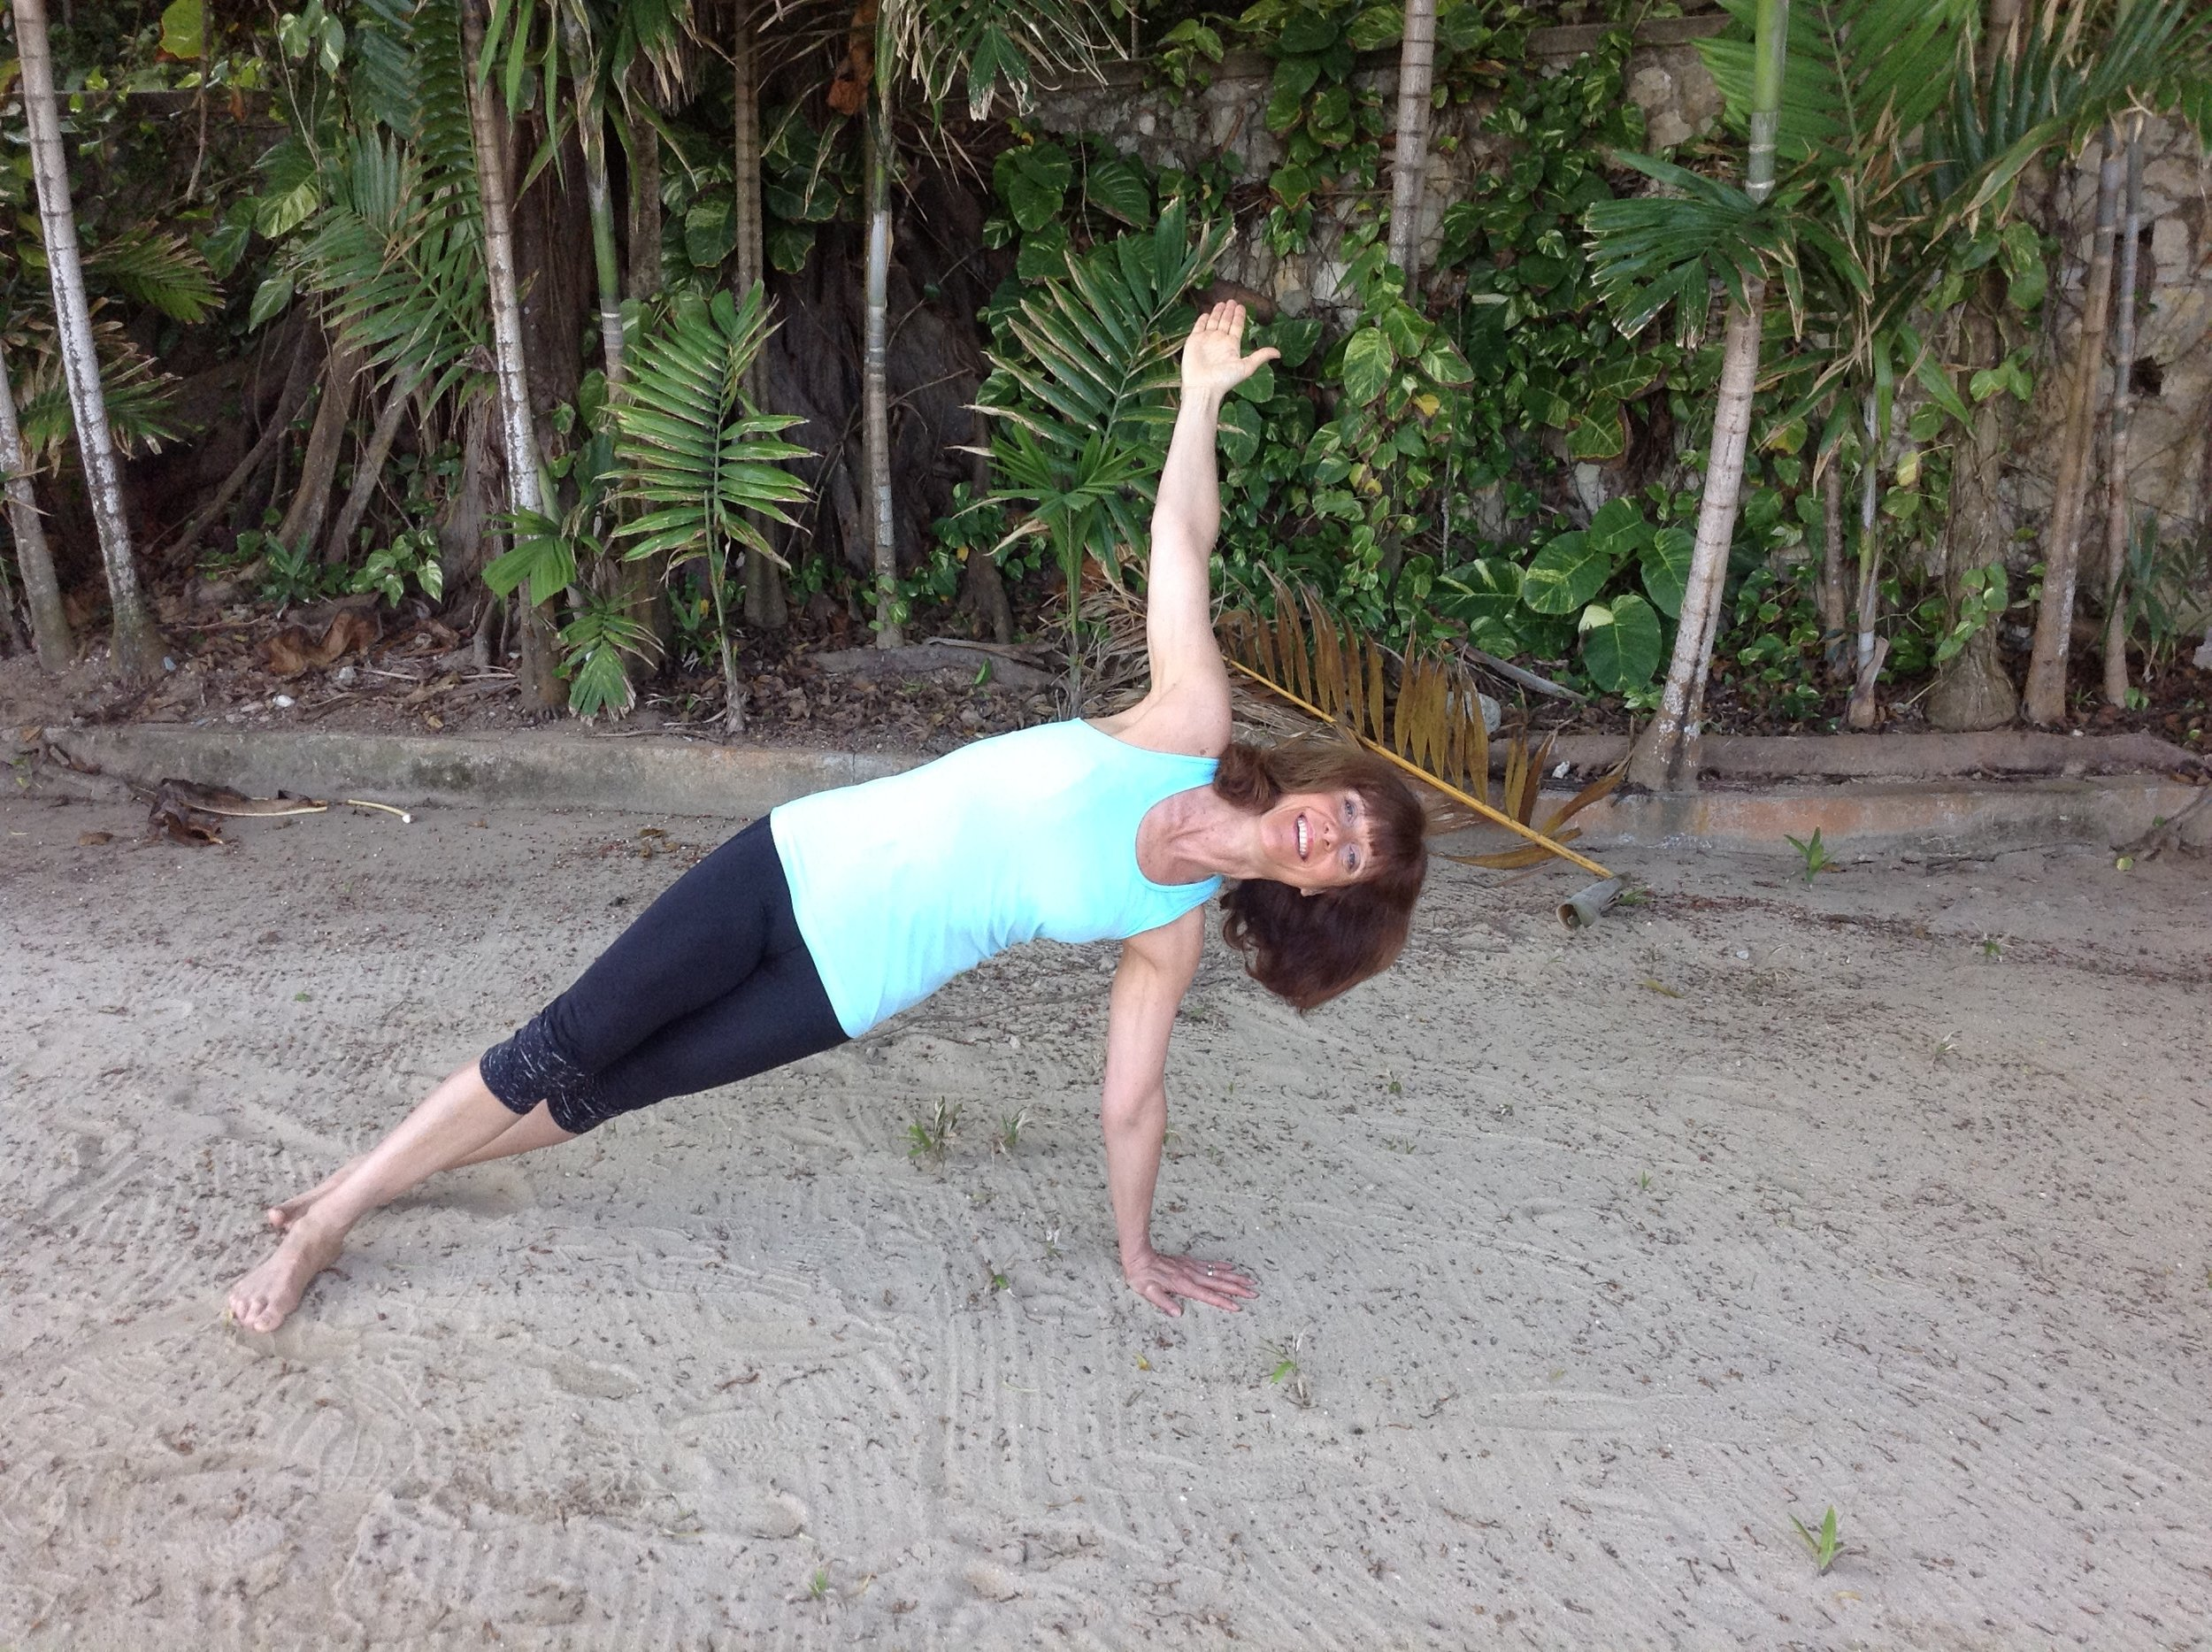 Instructor: Rosemary Hannam - OCR Level 3 Pilates, Pilates Institute London, Pilates based Matwork, Future Fit Training Next Step Pilates.